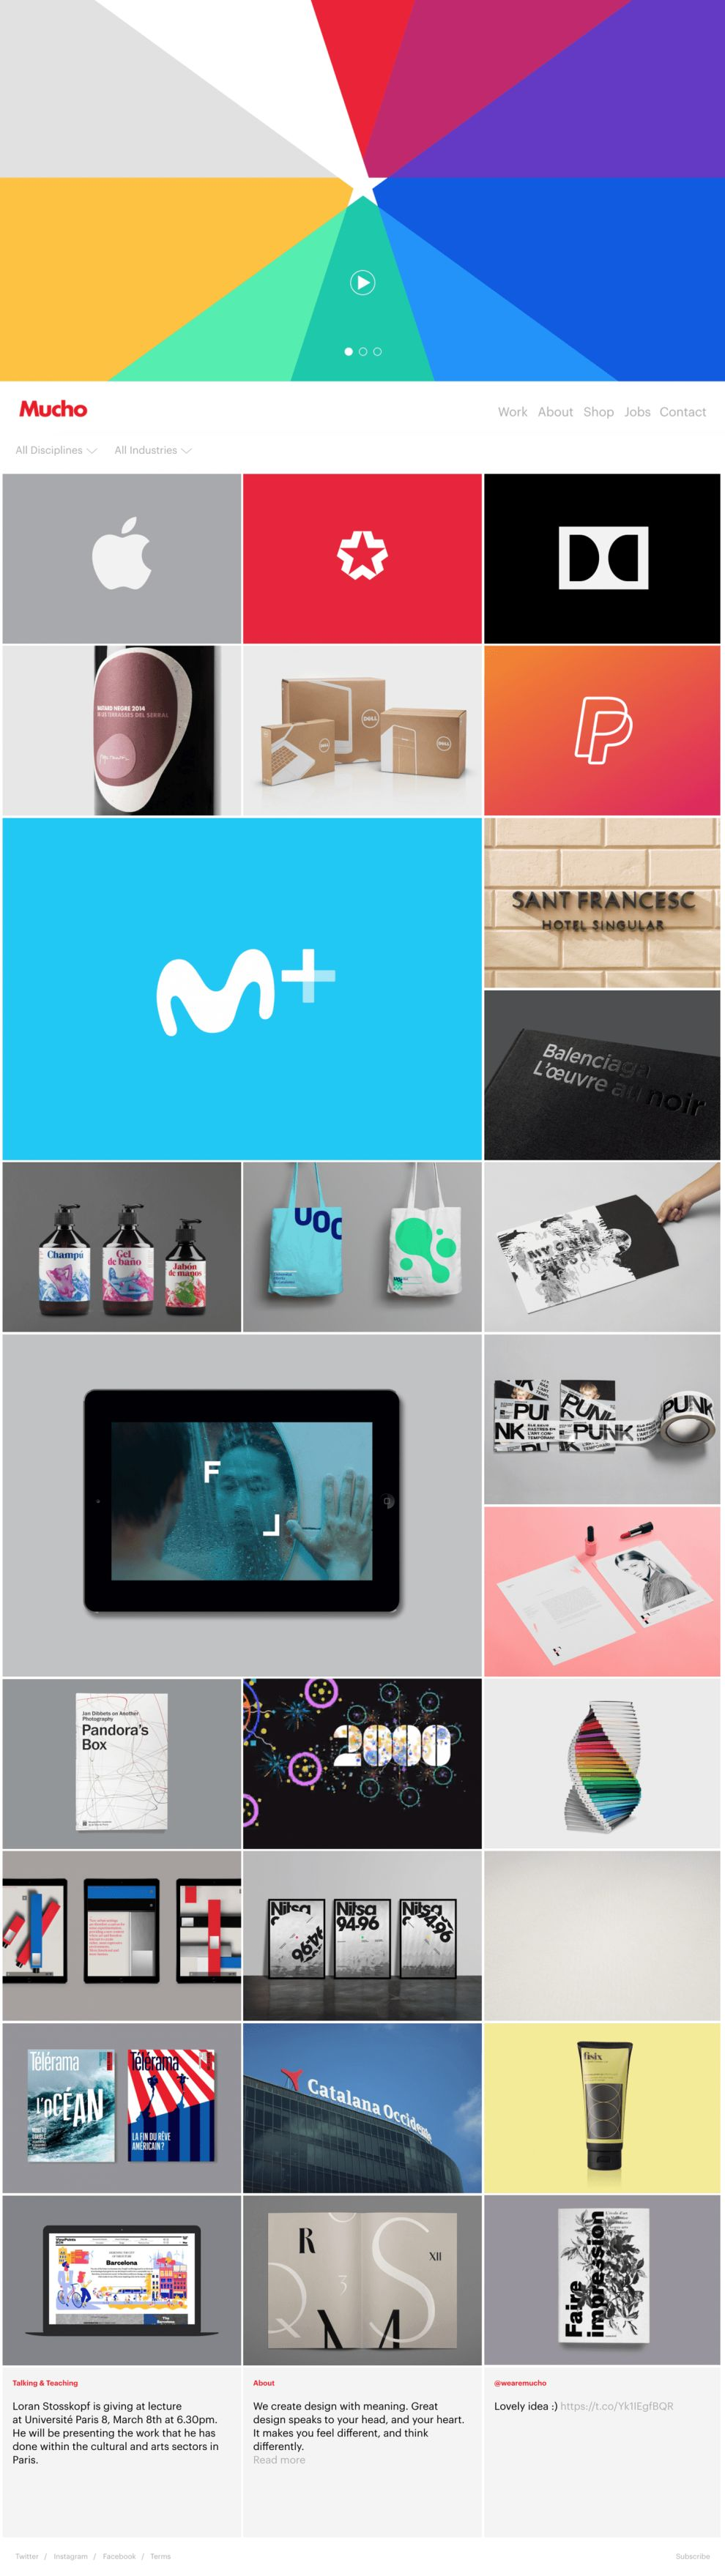 We Are Mucho Beautiful Homepage